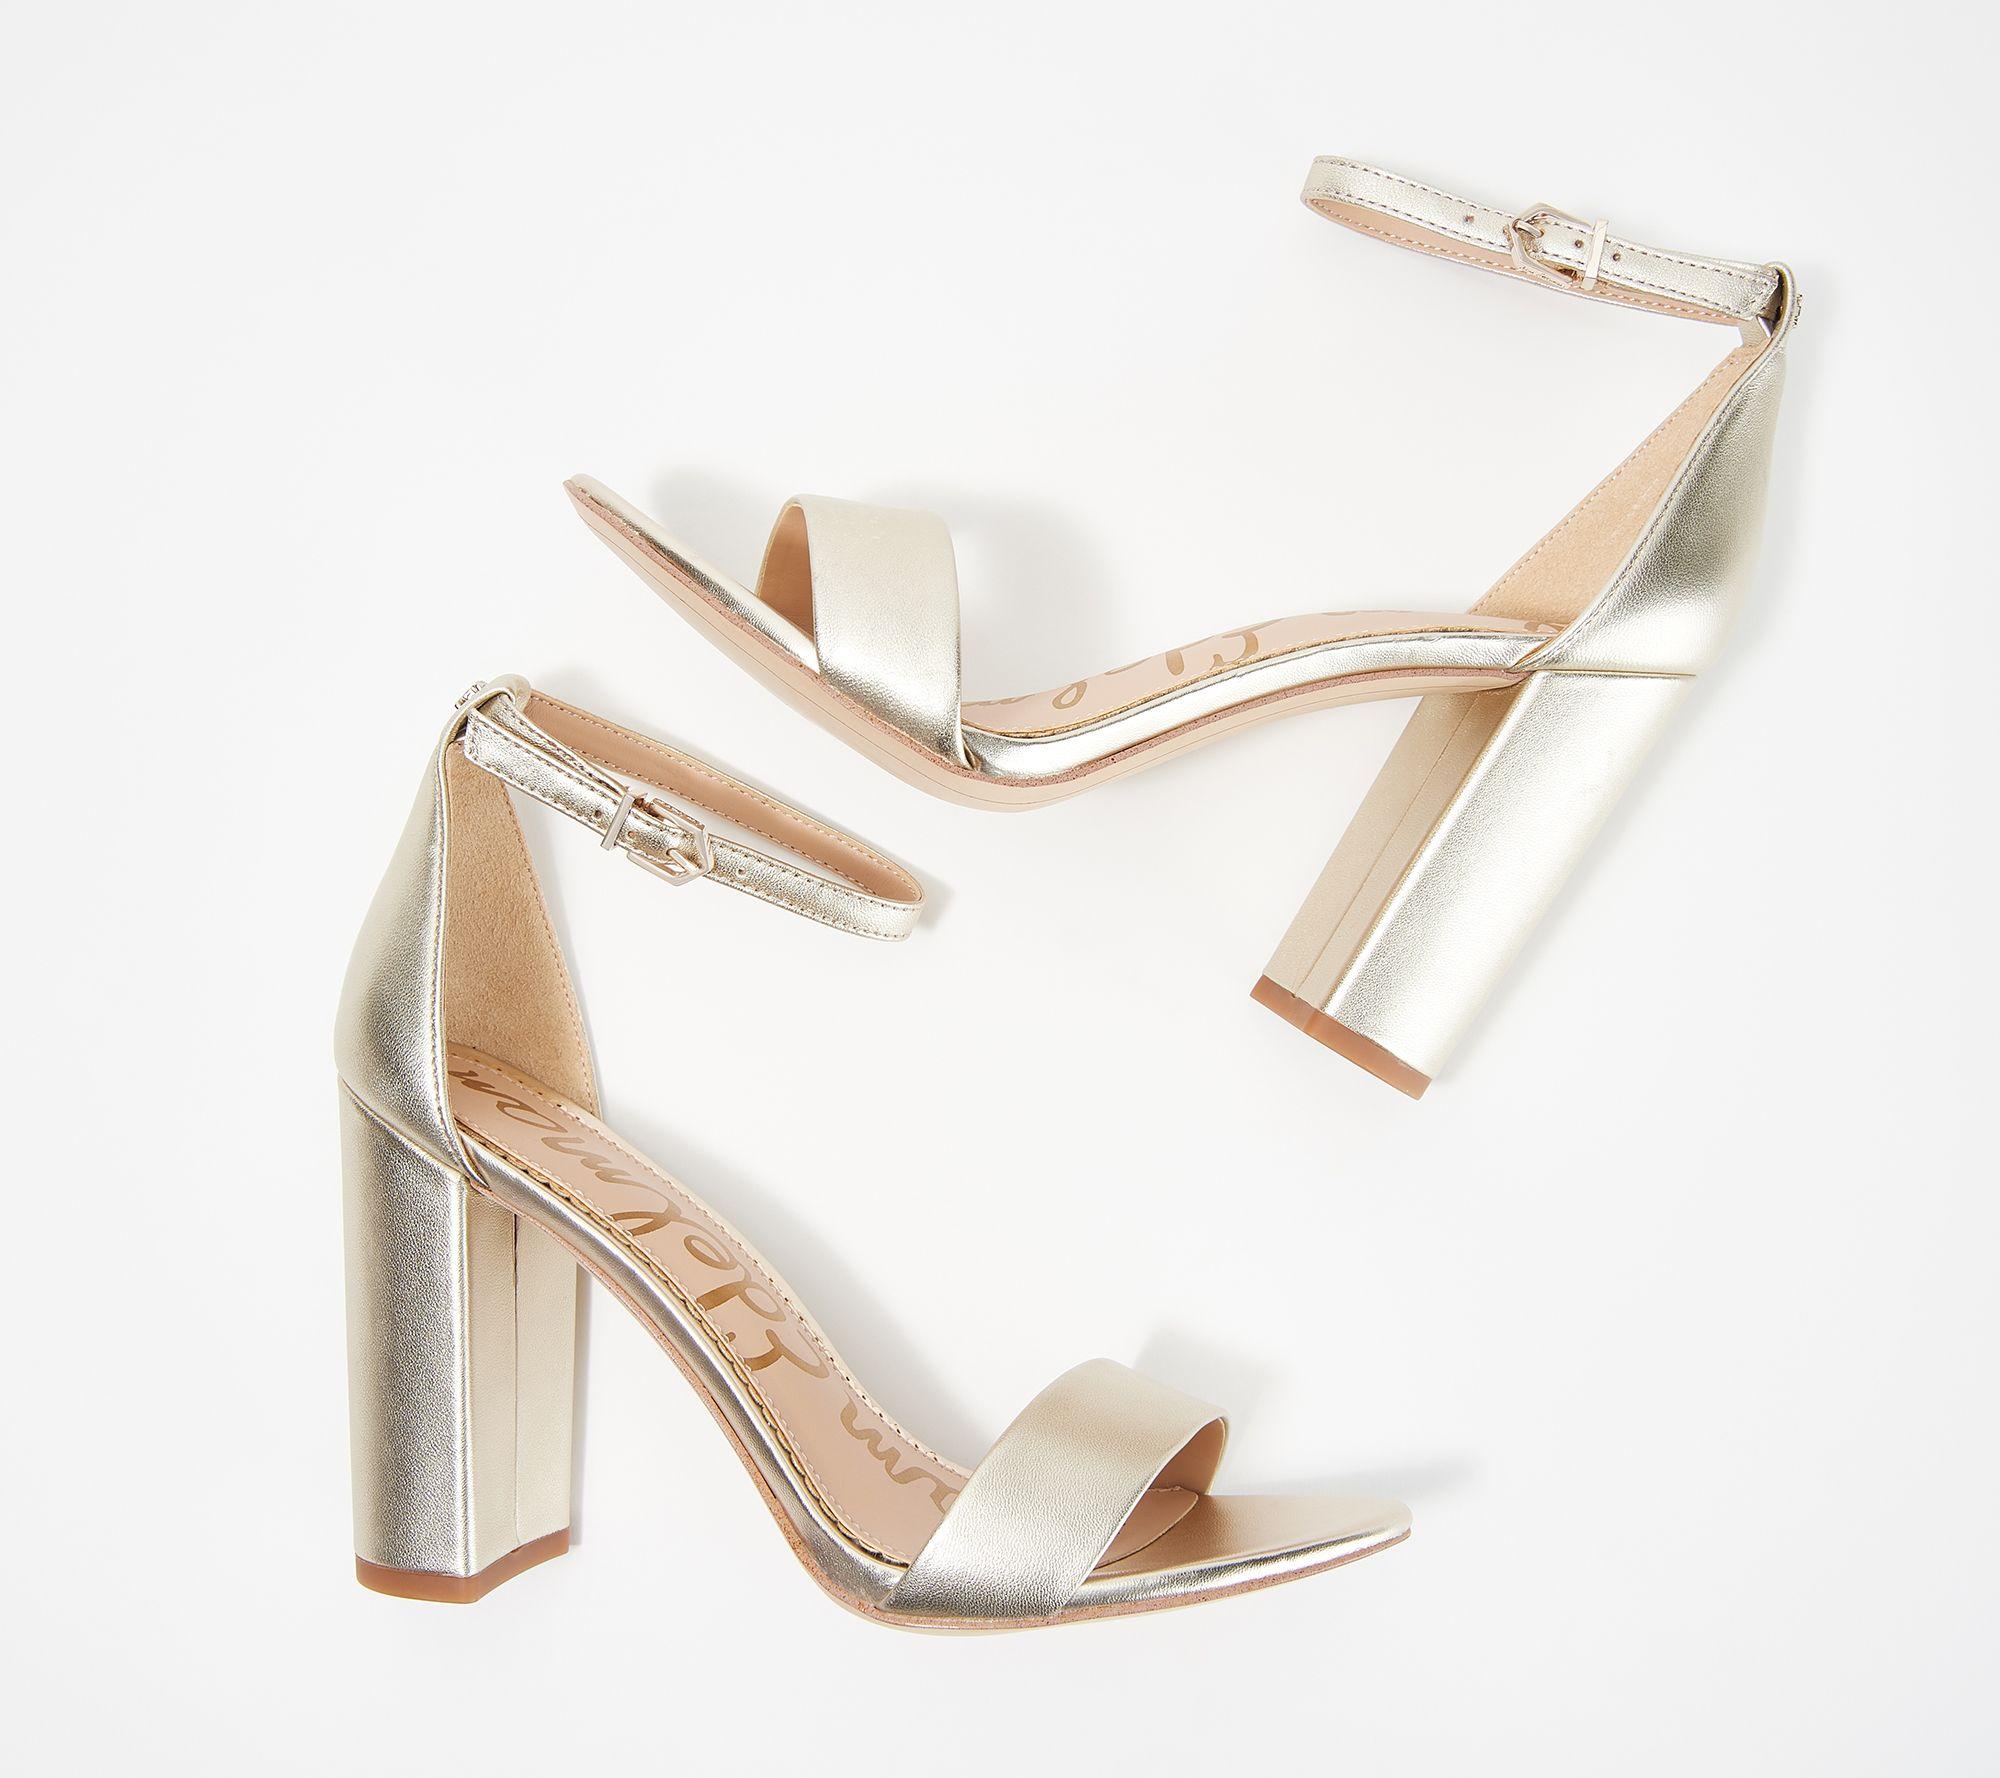 3c4c2ad8c71 Sam Edelman Classic Two-Piece Heeled Sandals - Yaro — QVC.com